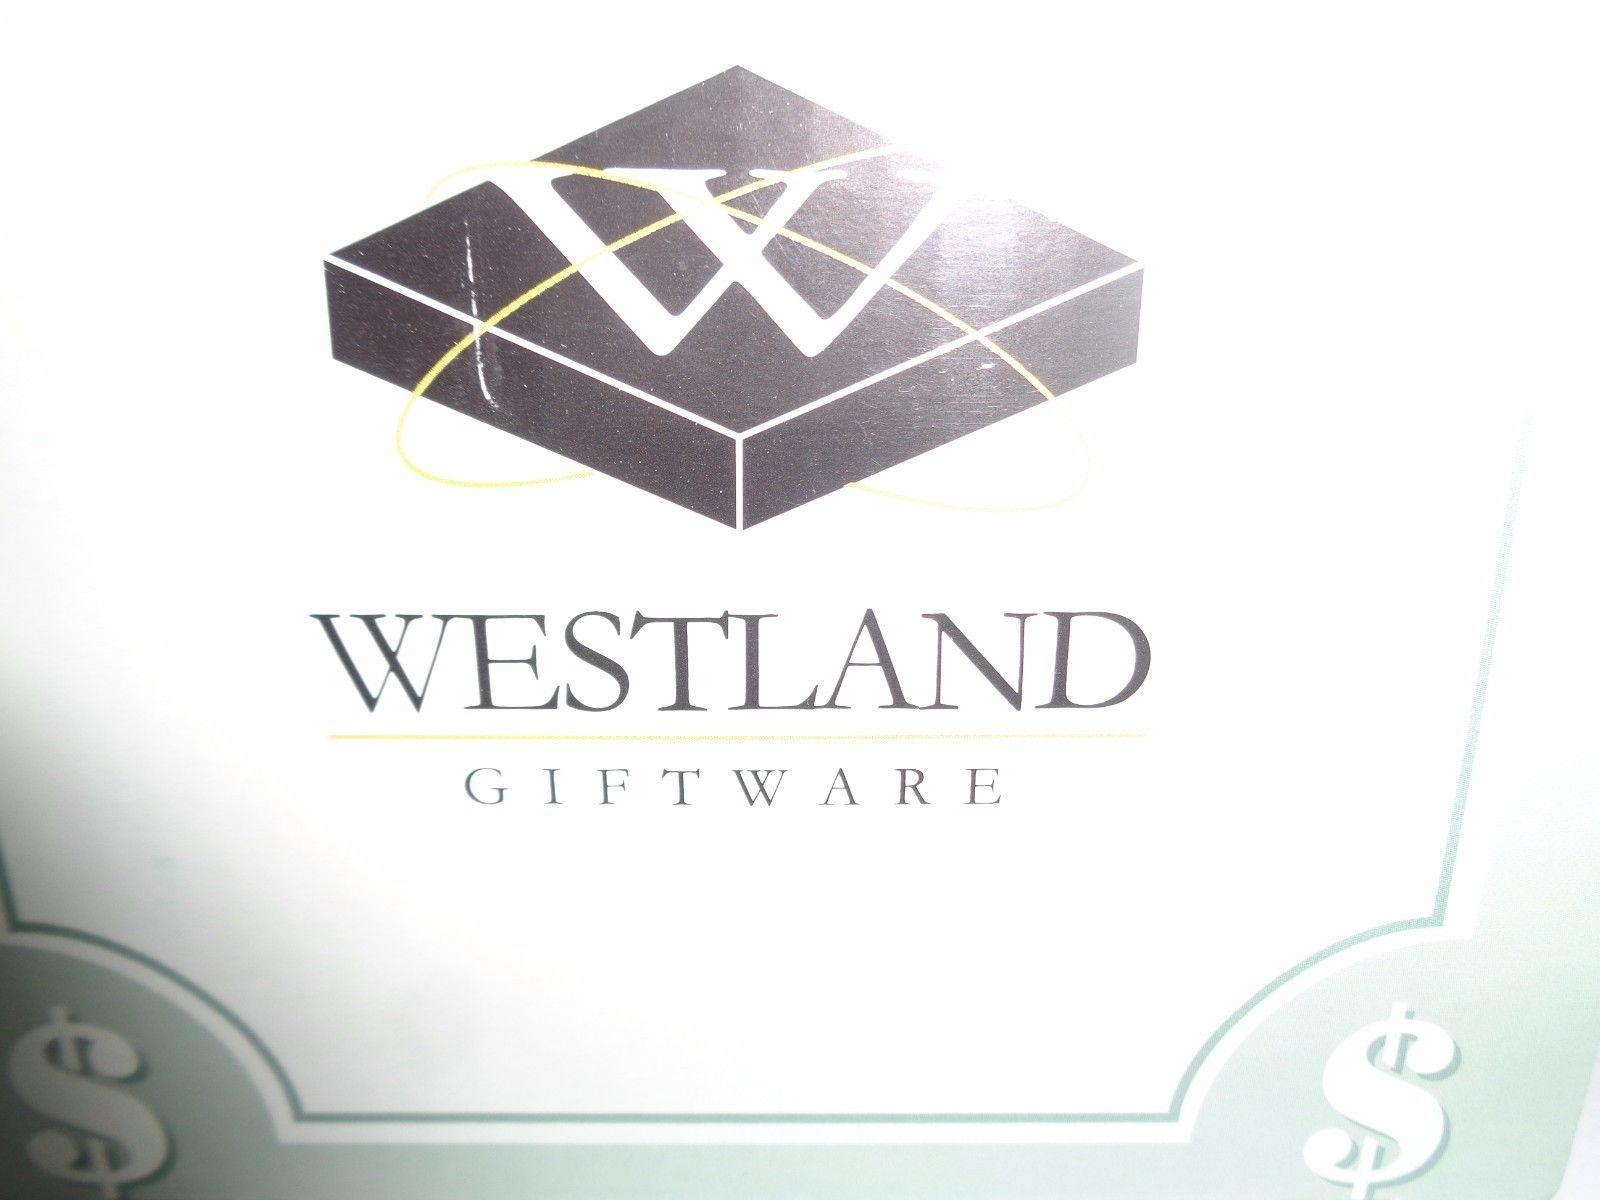 MY BOTOX BAILOUT Silver Tin Bank Westland Giftware NIB Novelty Funny